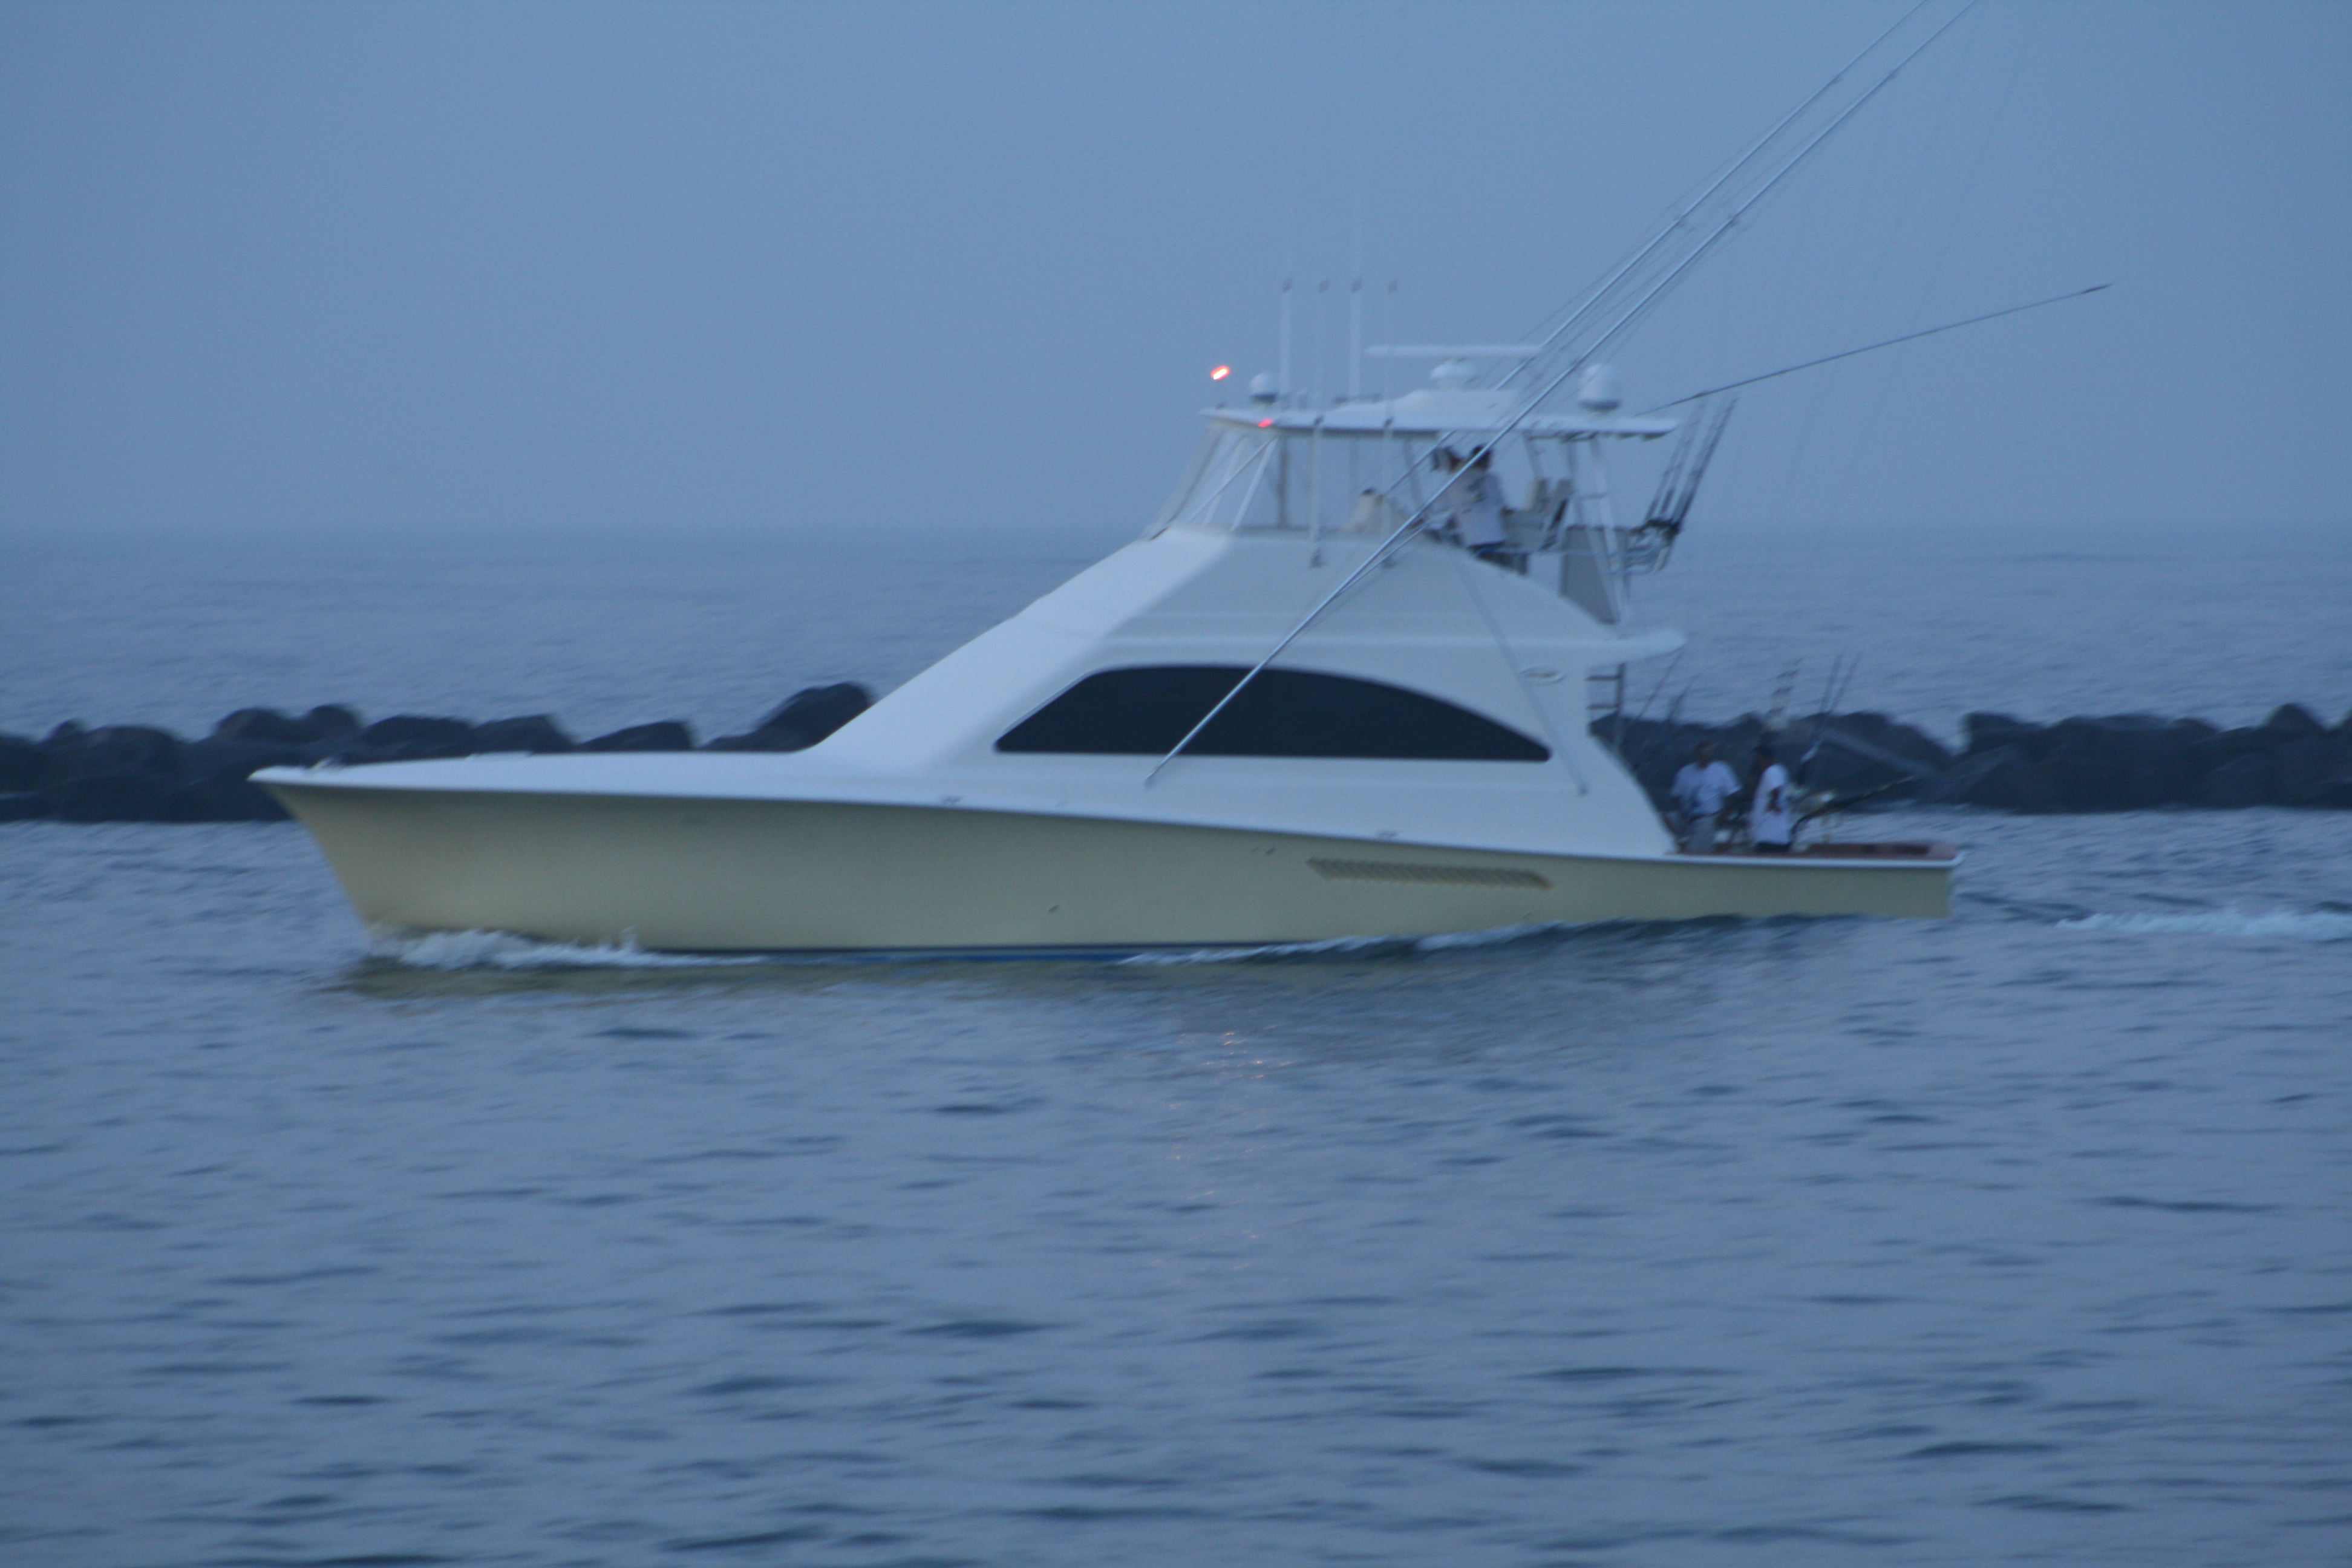 Boat, City, Luxury, Ocean, Sail, HQ Photo